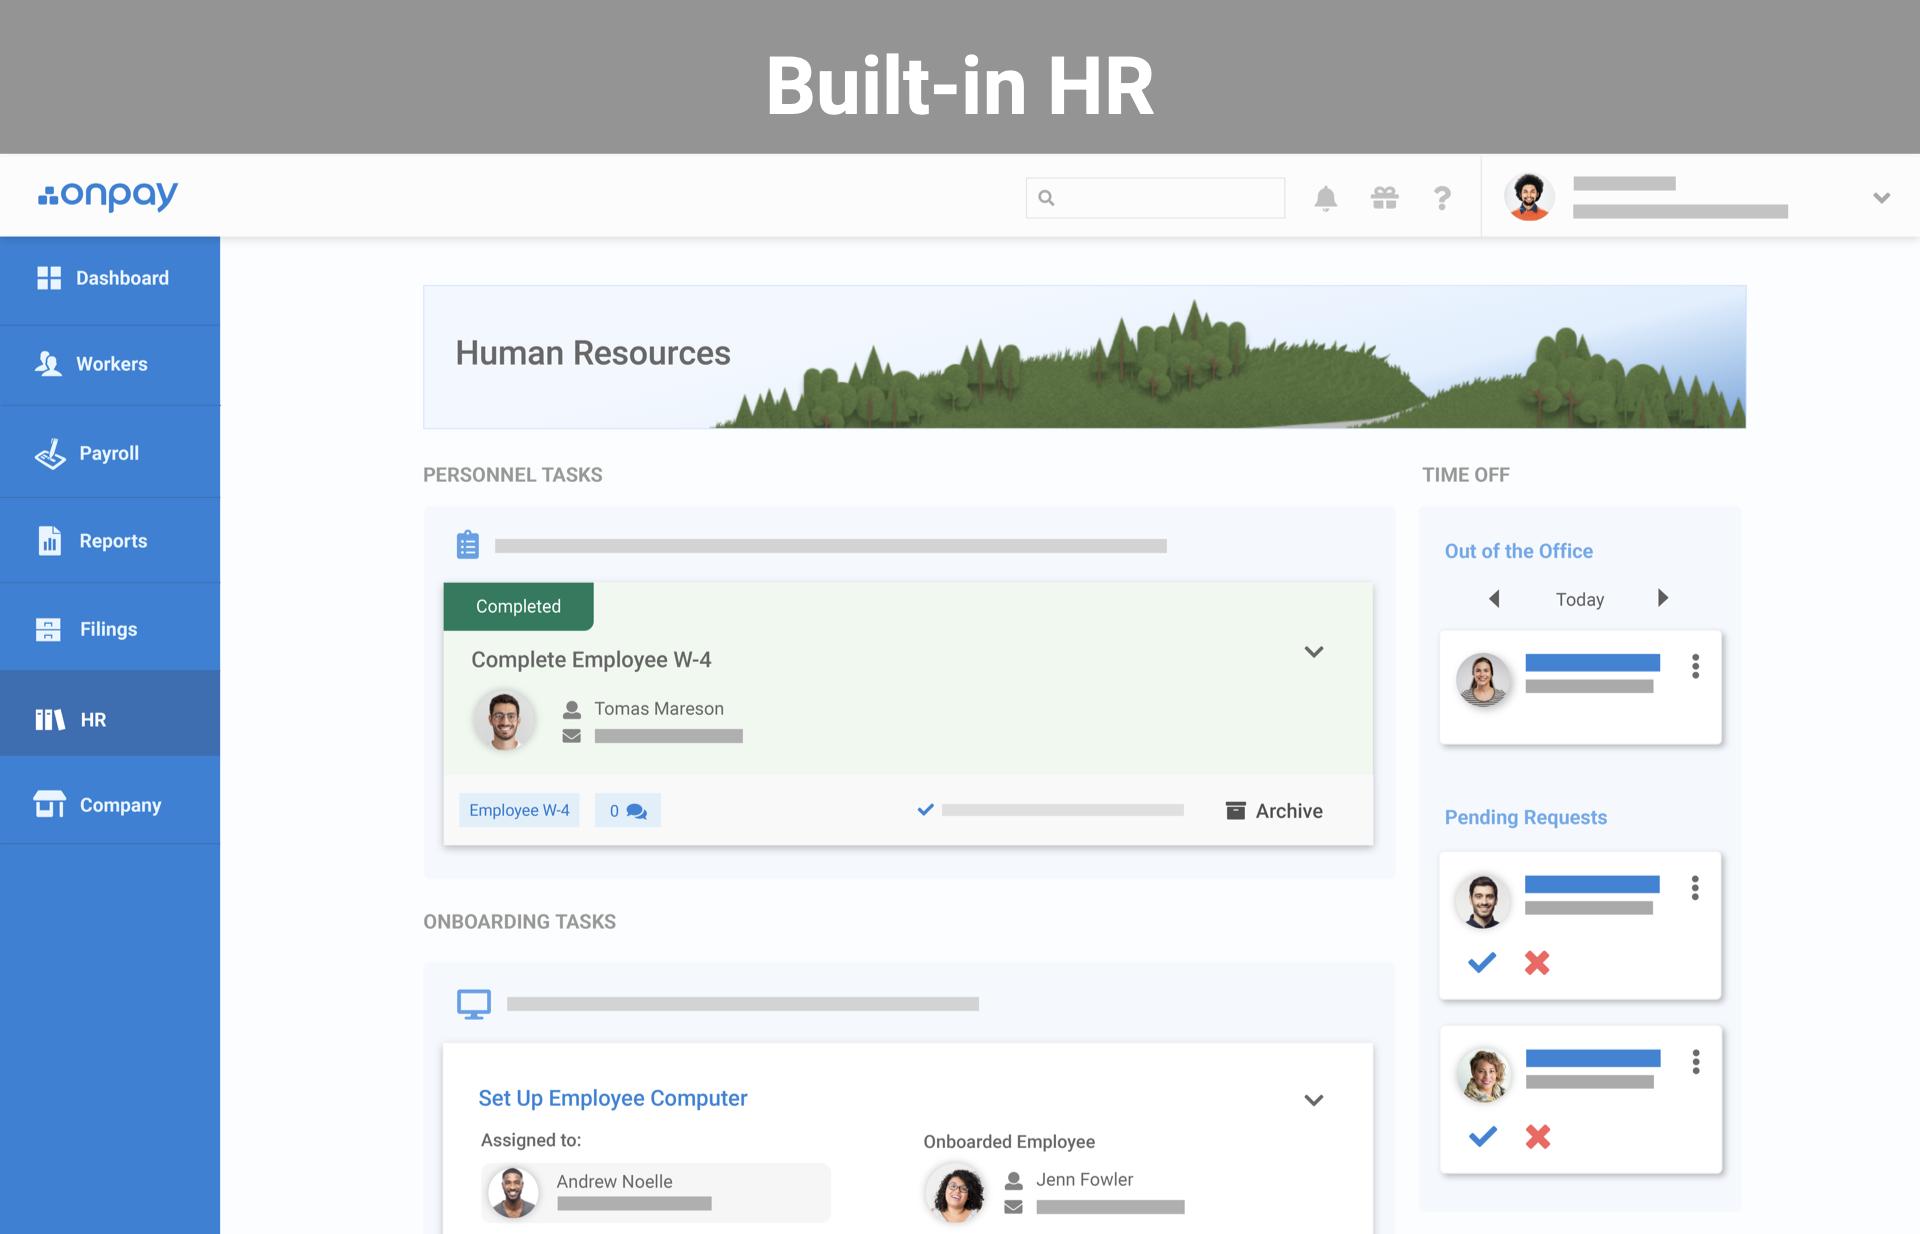 A full set of HR tools